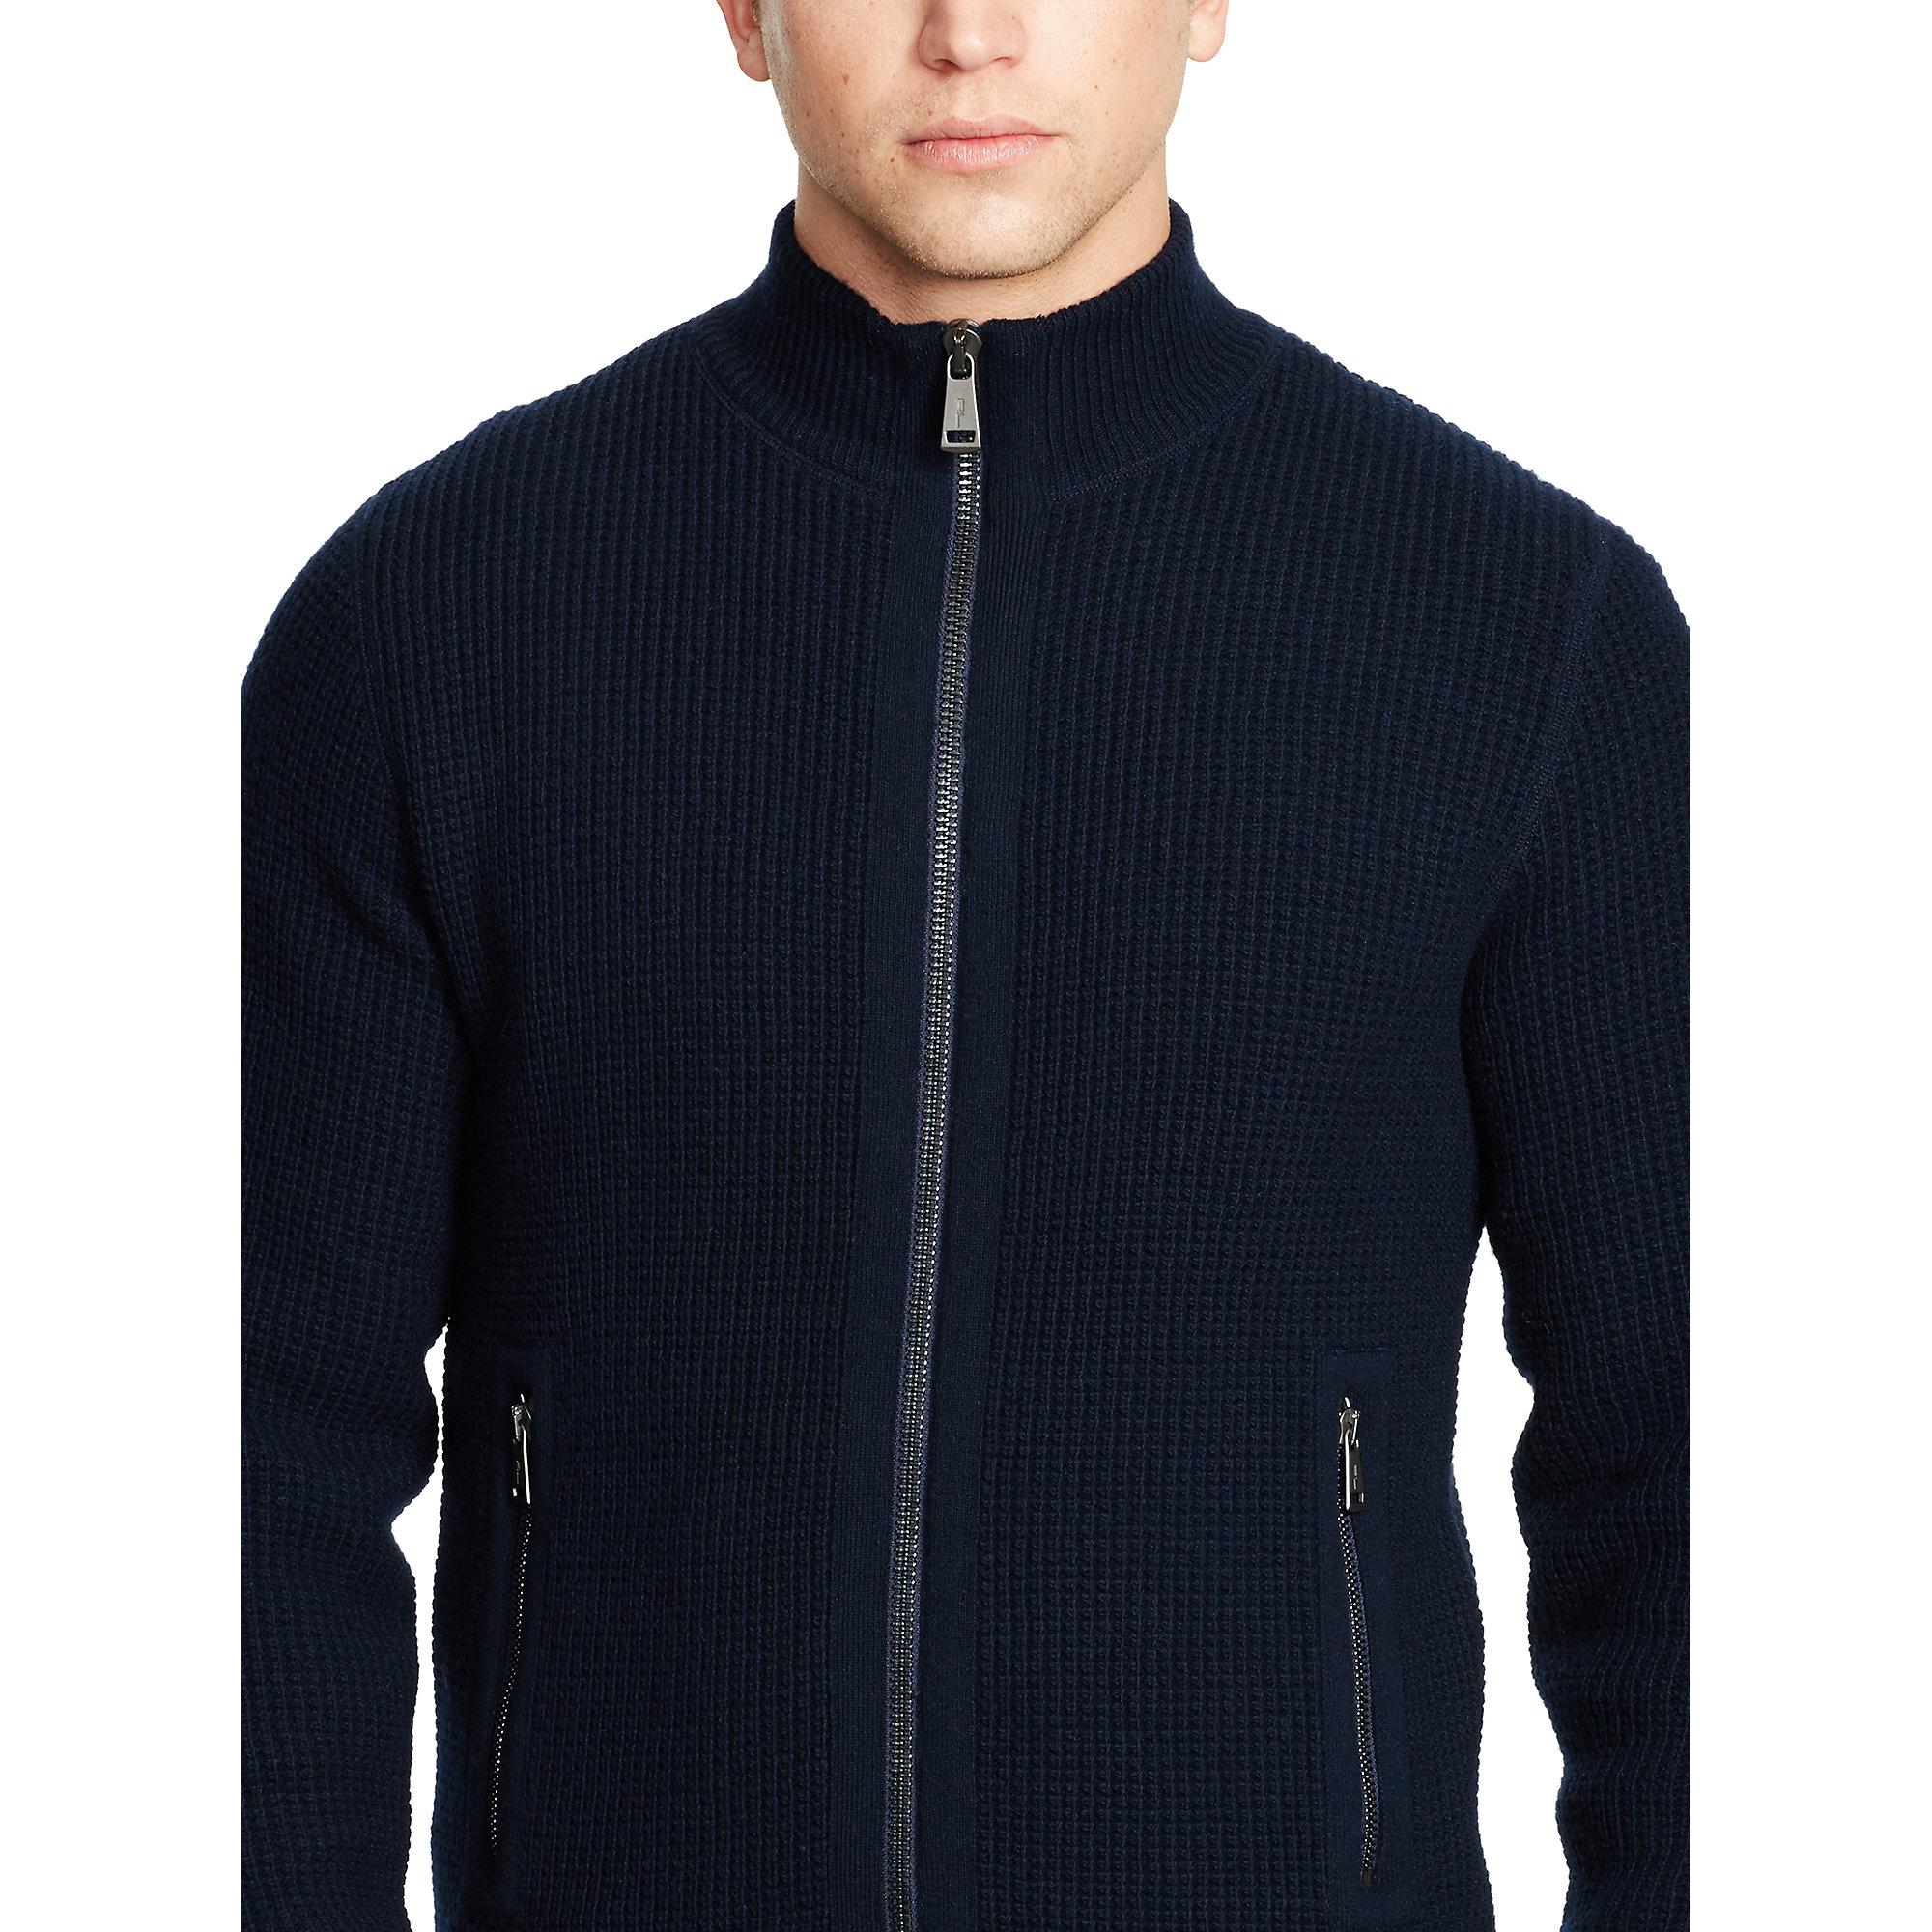 Polo ralph lauren Wool-blend Full-zip Sweater in Blue for Men | Lyst